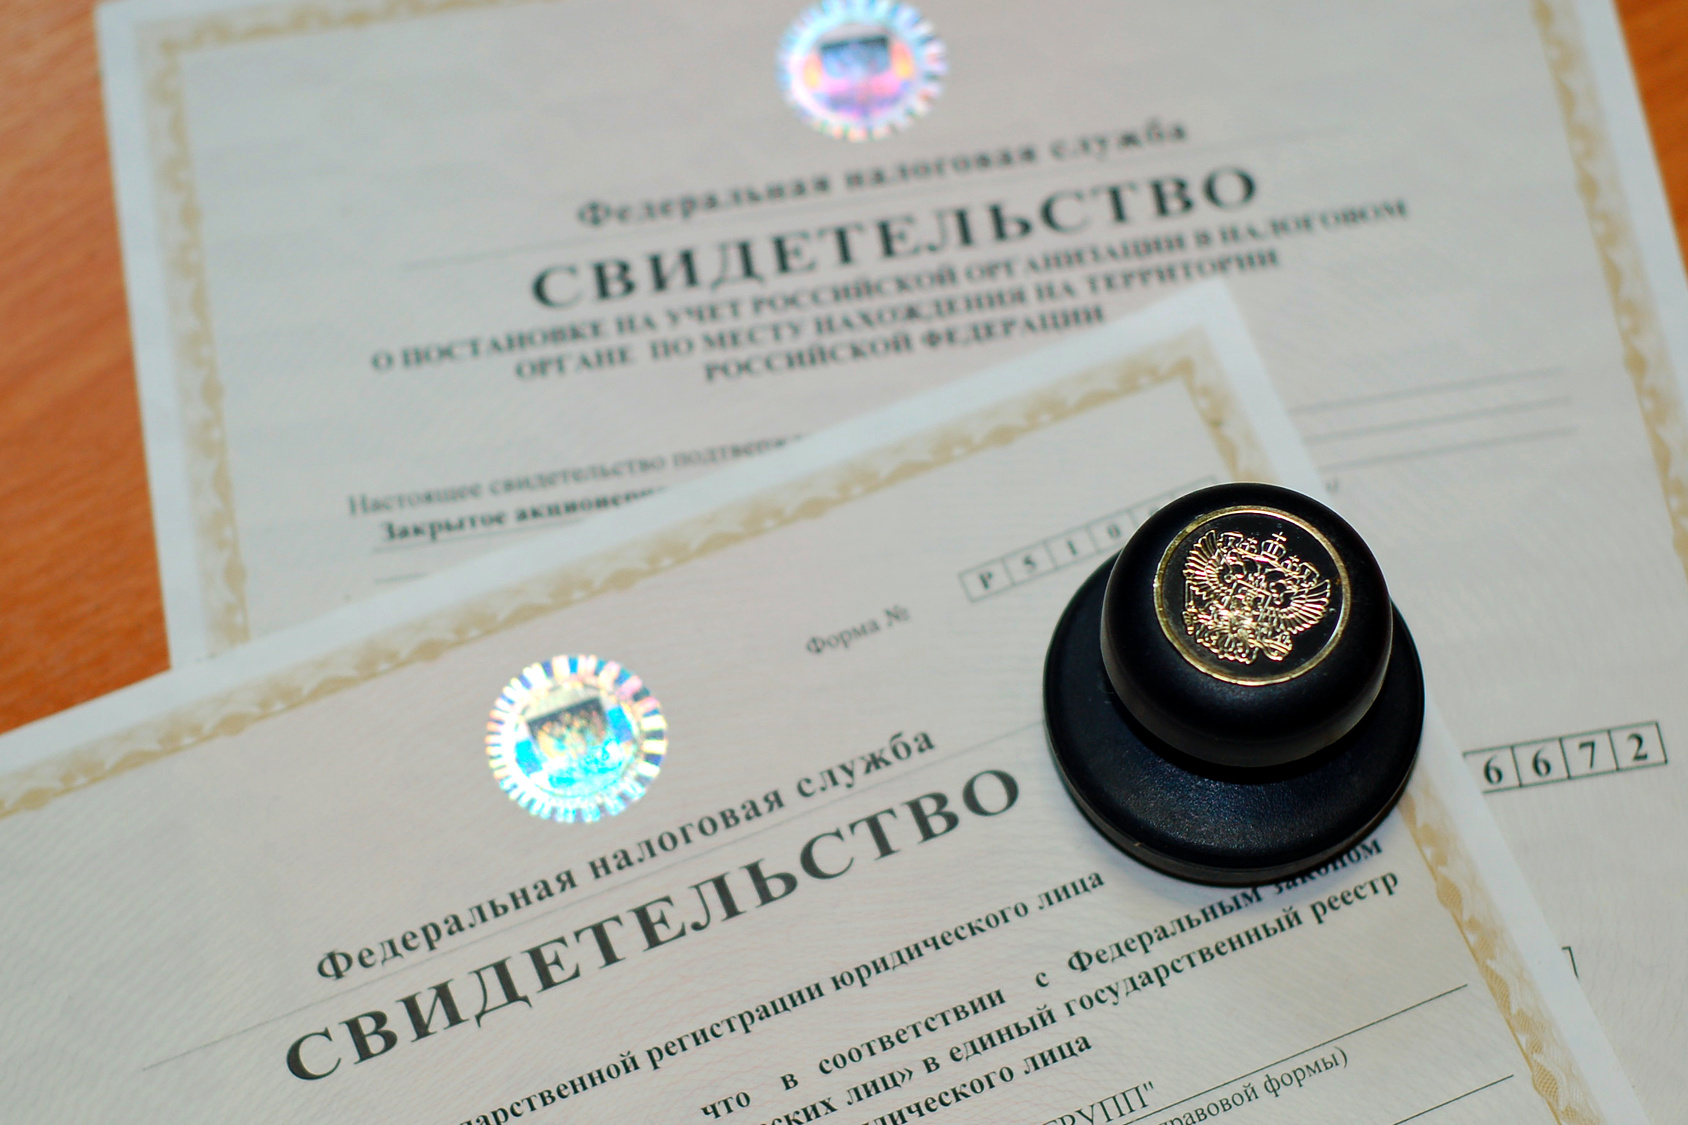 Регистрация фирм ооо предприятий декларация 3 ндфл лист в строка 130